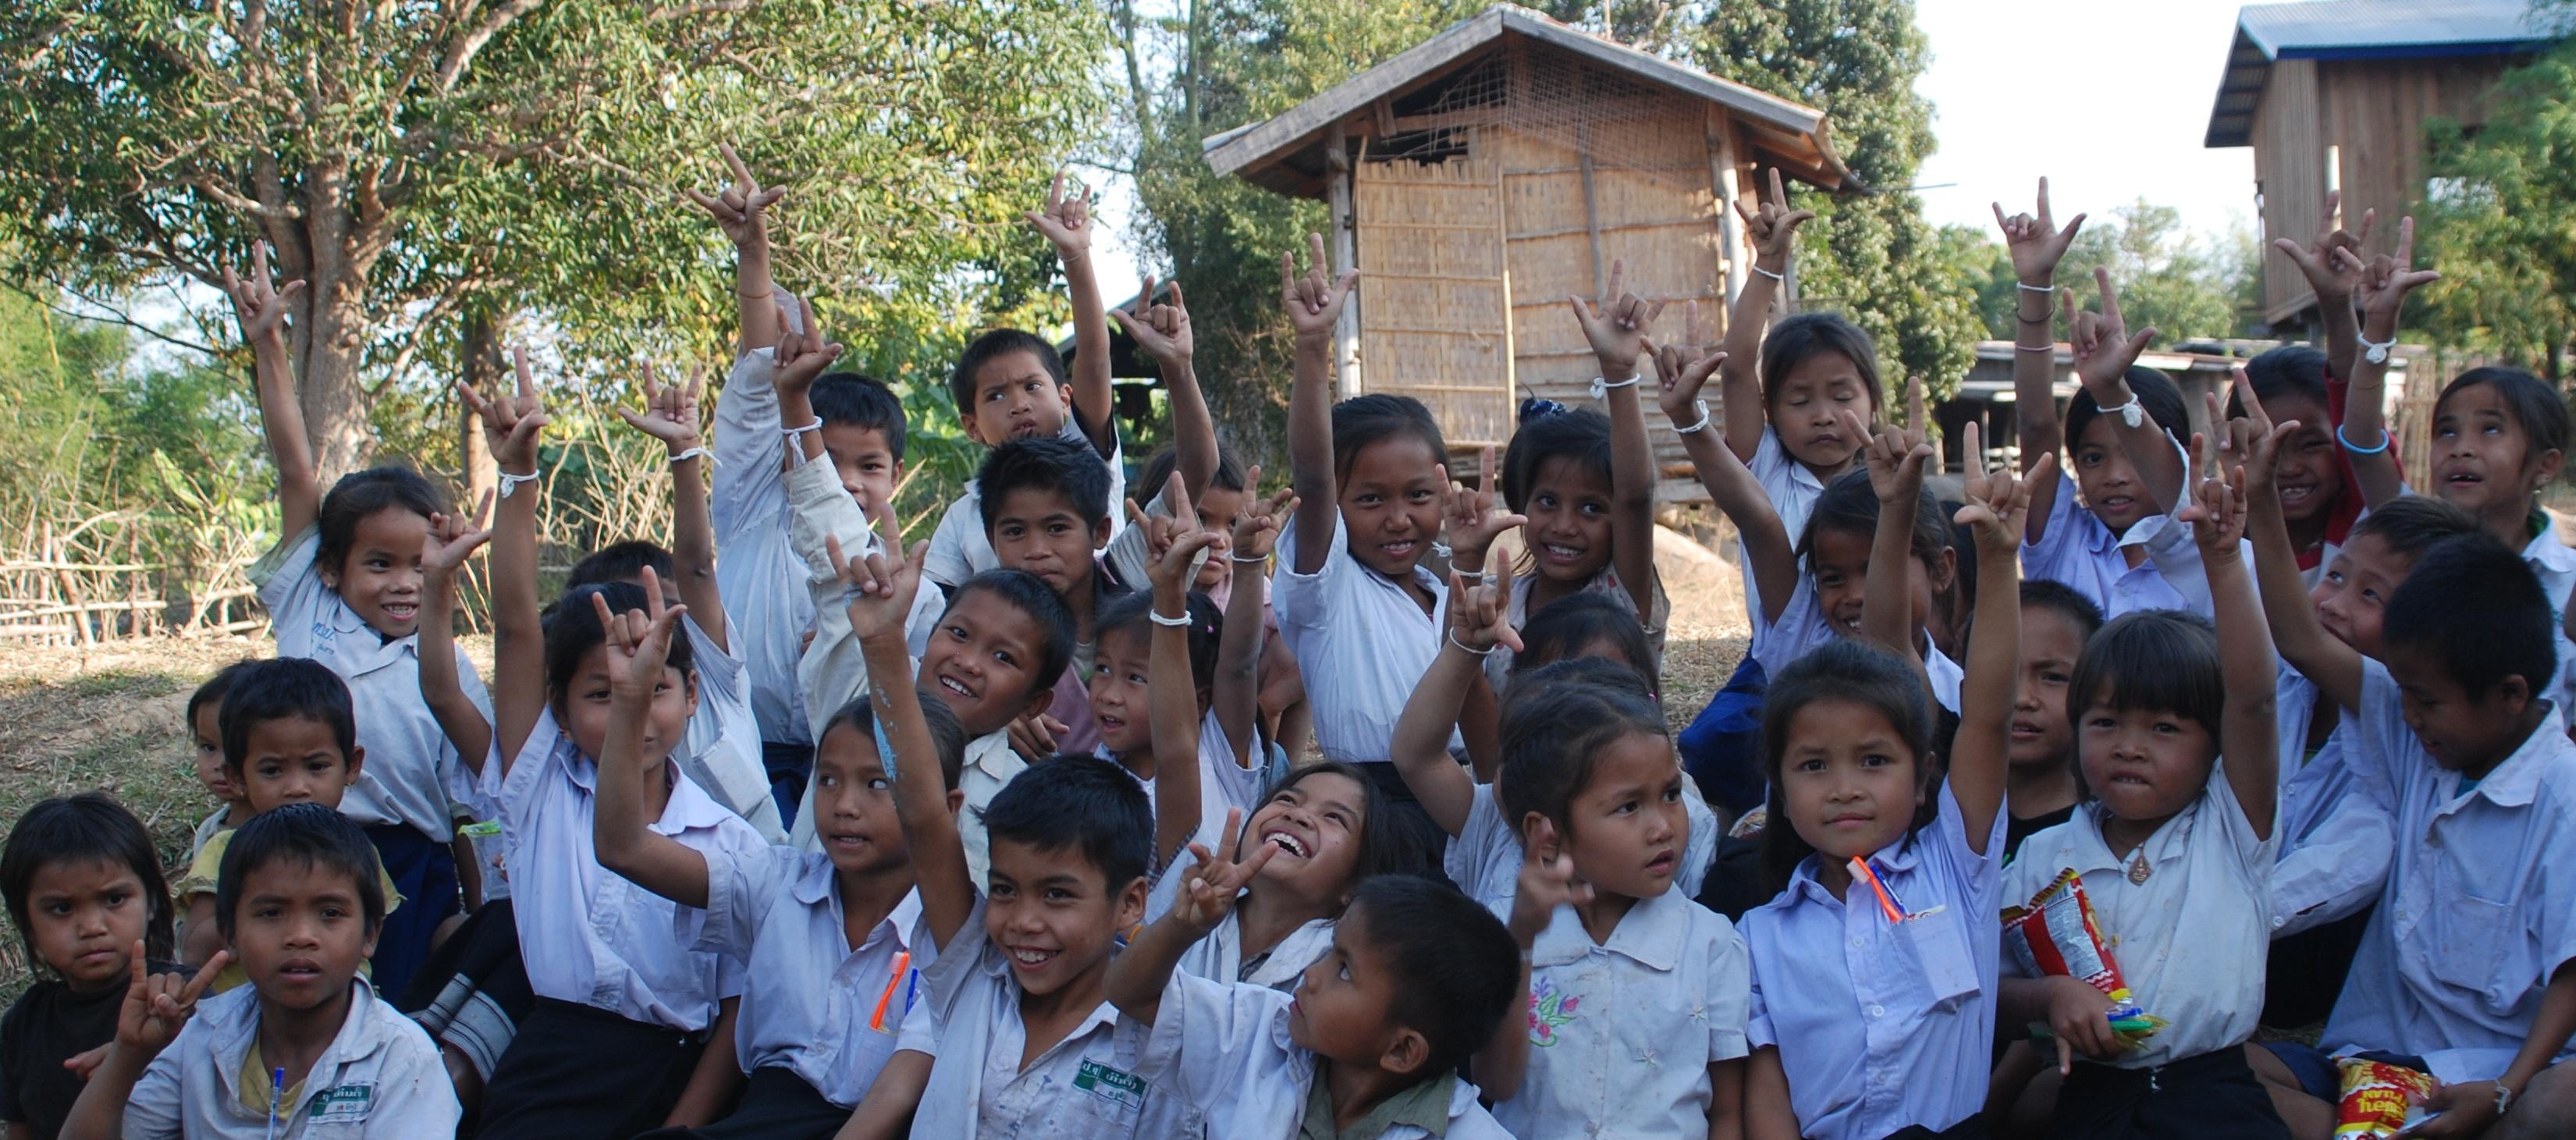 student's pure joyful smiles